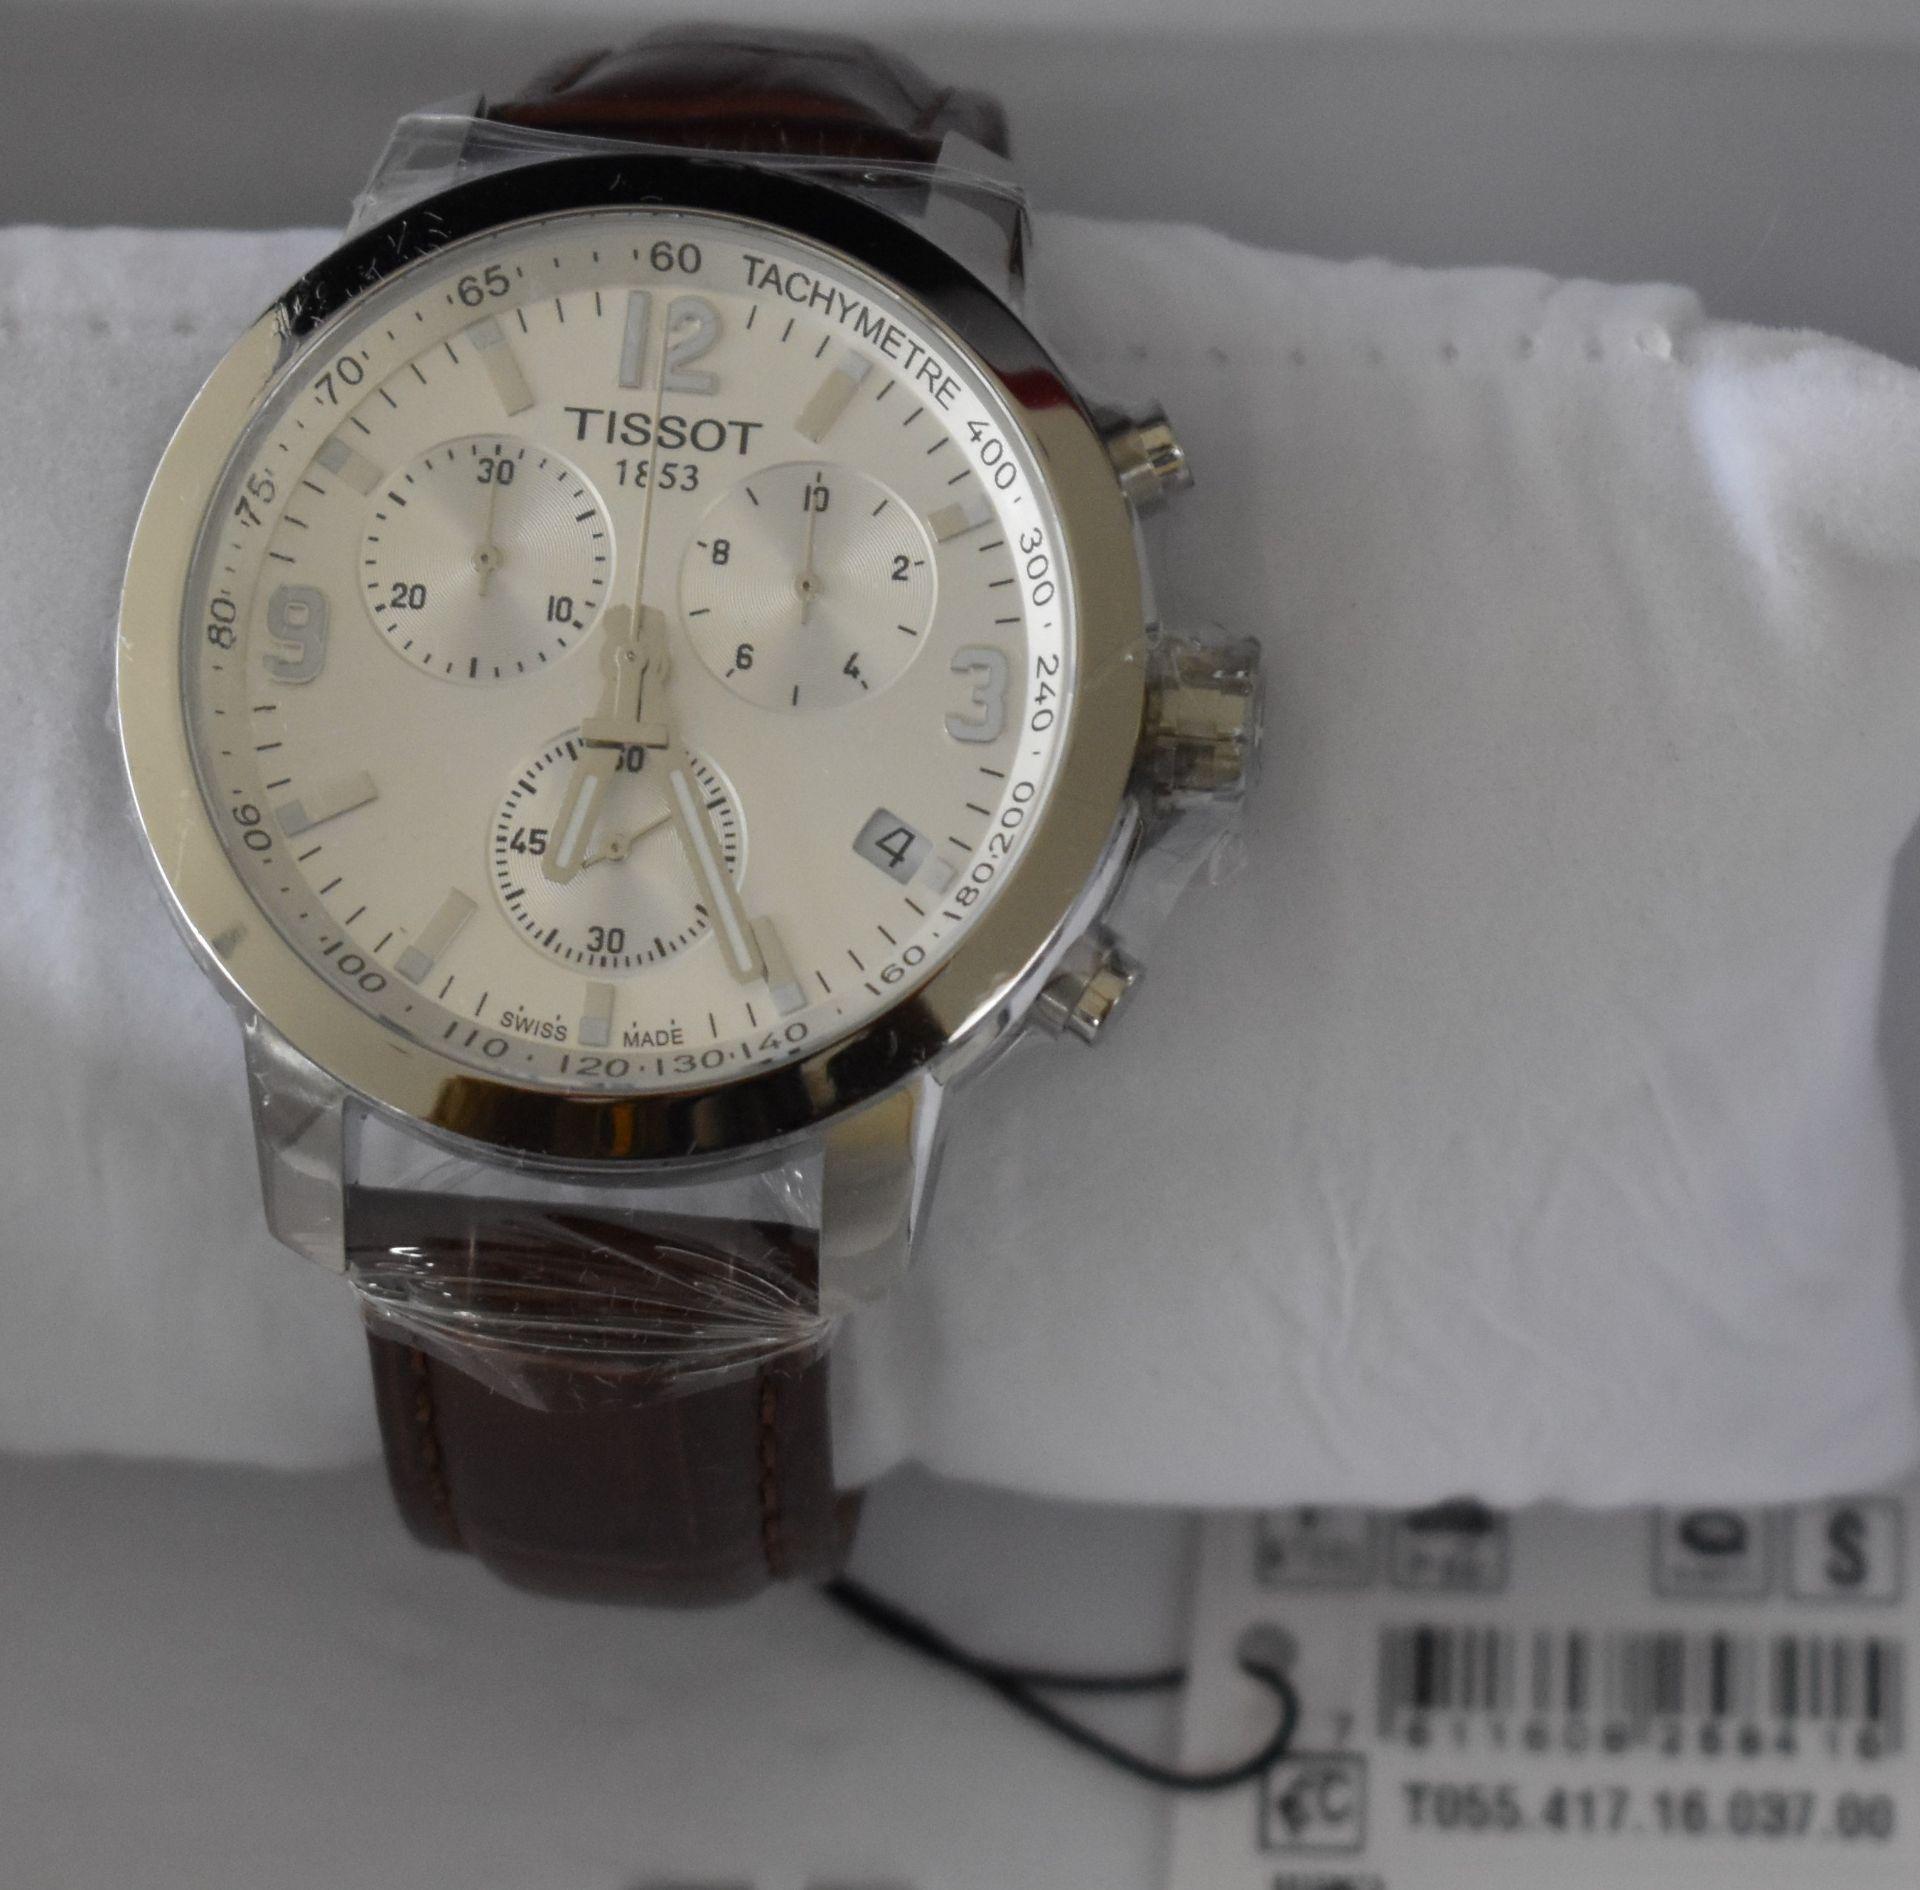 Tissot Men's Watch TO55.417.16.037.00